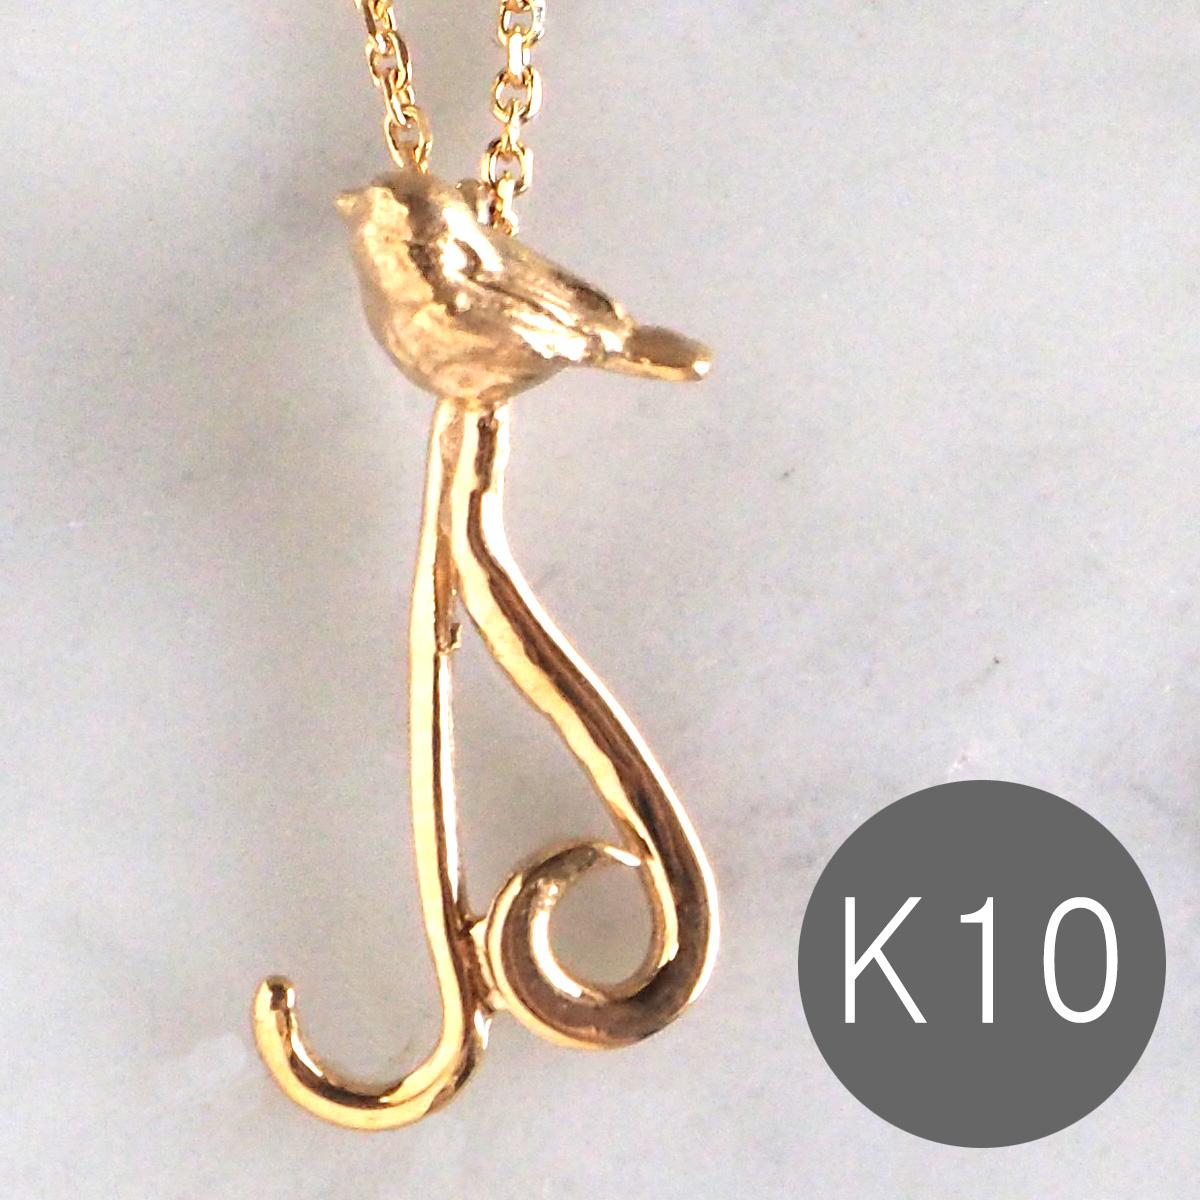 "DECOvienya(デコヴィーニャ) 手作りアクセサリー 10Kゴールド イニシャルネックレス ""S"" シジュウカラ 穏やかで安定した心 [DE-10K-S] ハンドメイド イニシャル S 鳥 bird メッセージ 鳥言葉 お守り 華奢 シンプル 10金 日本製 国産"